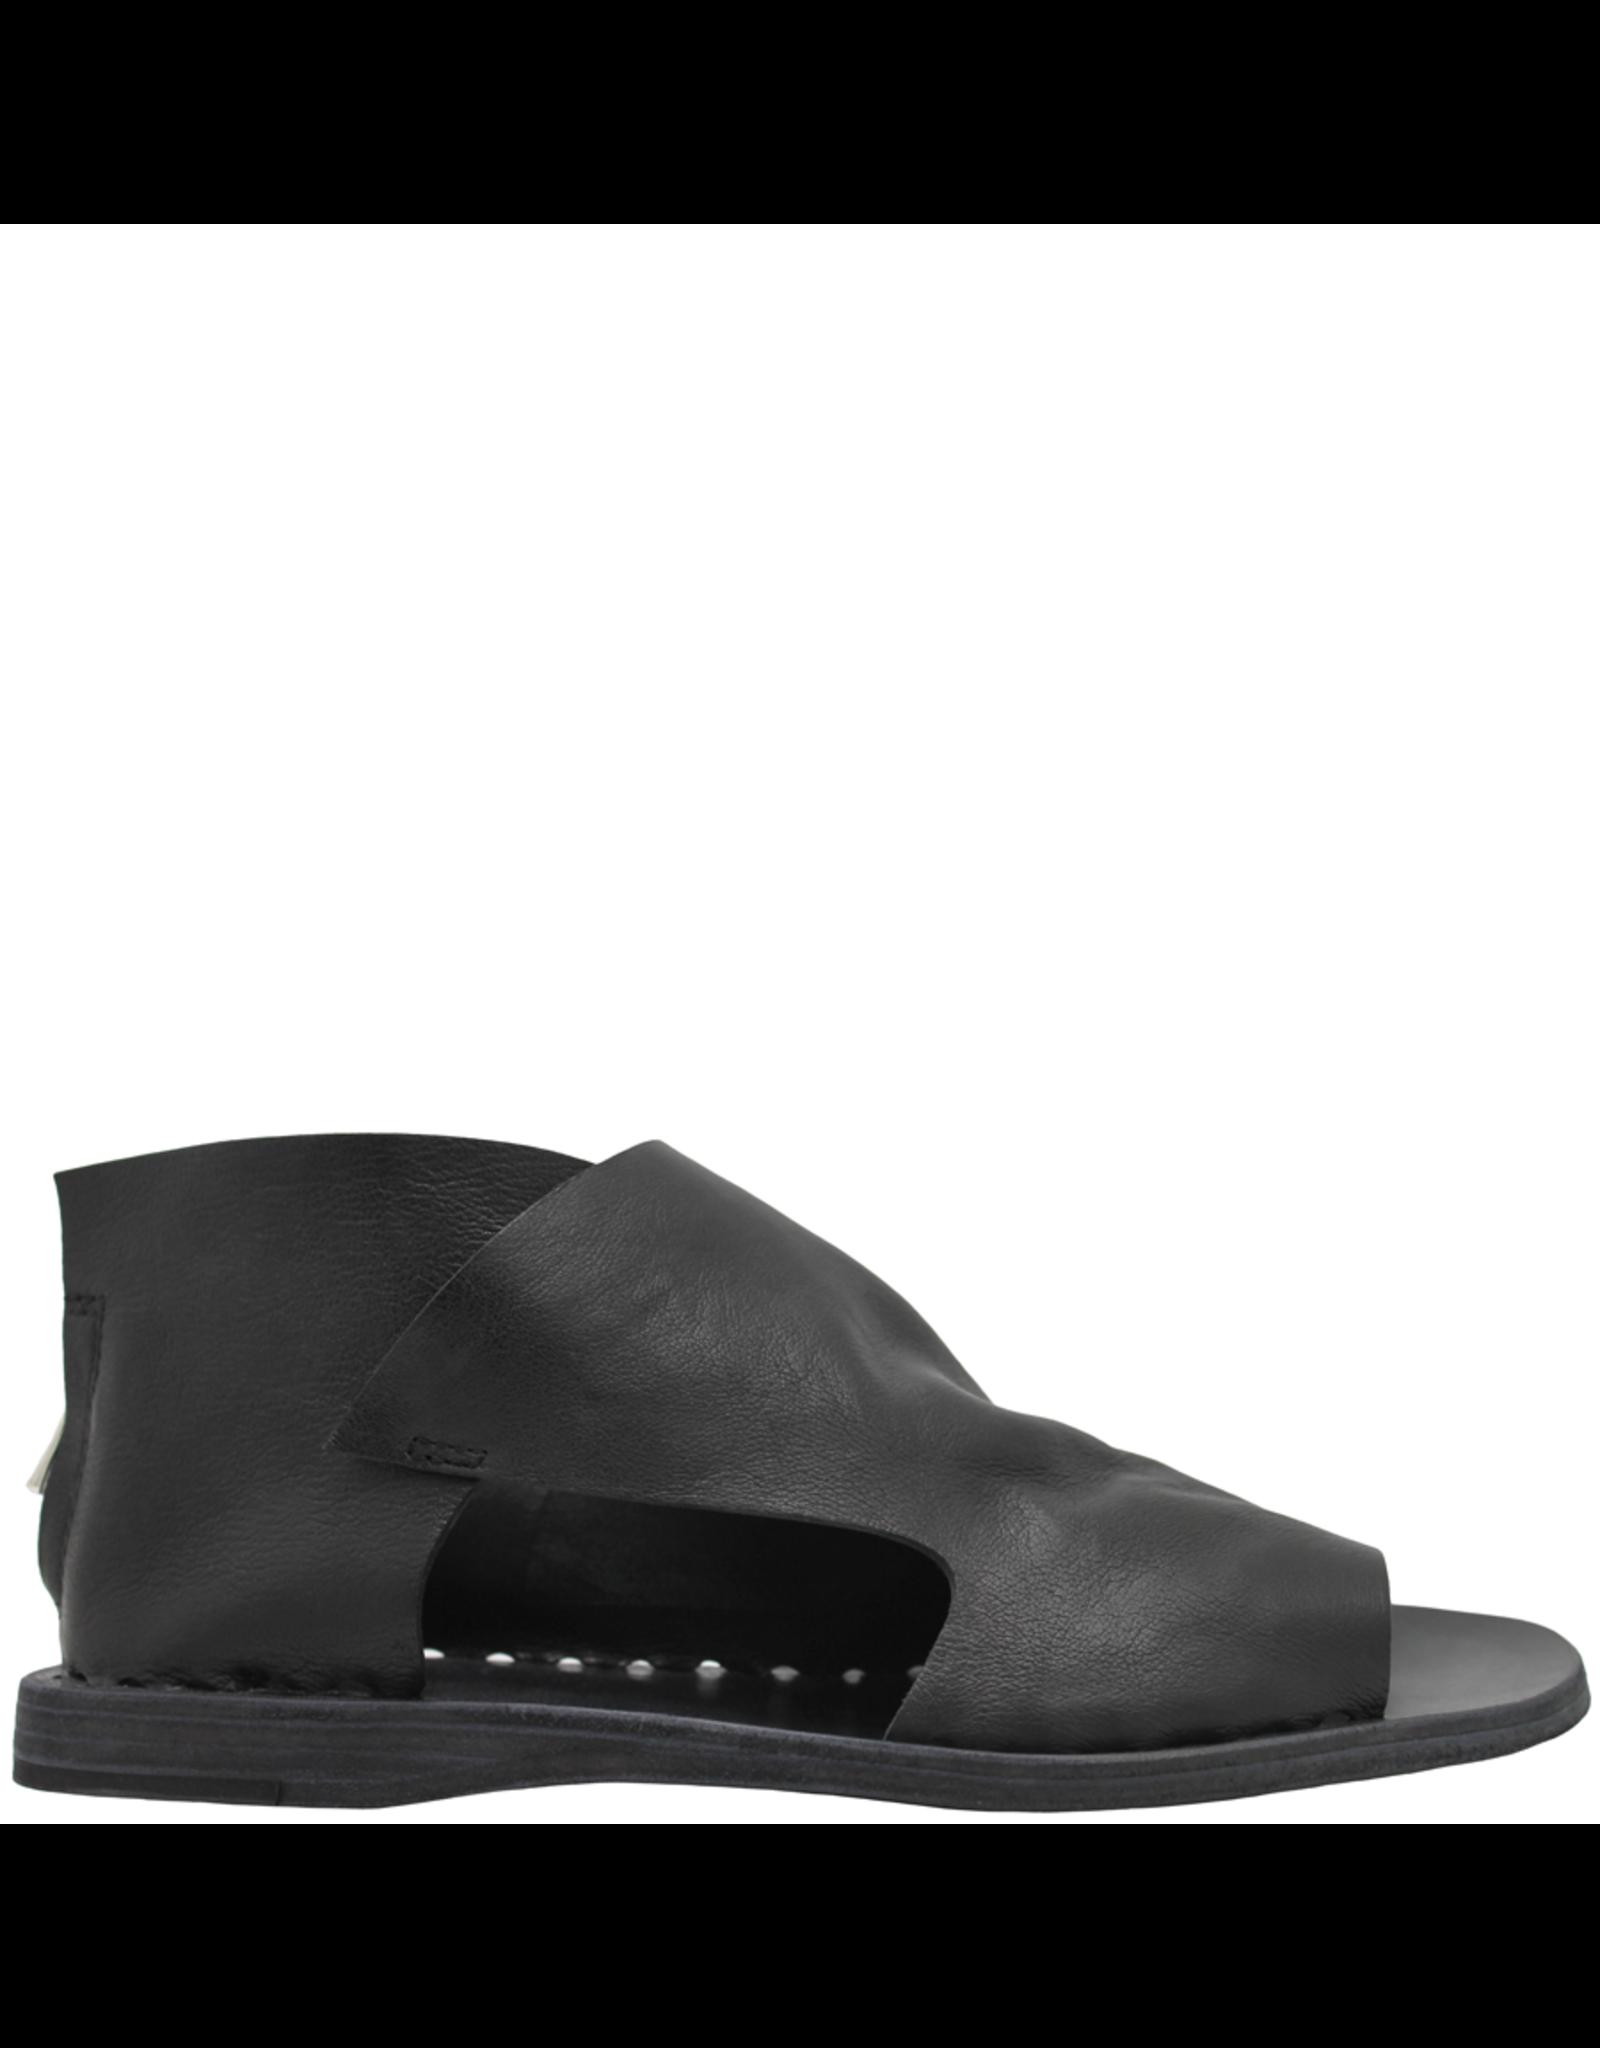 Officine Creative OfficineCreative Black Flat Sandal With Back Zipper Hunter